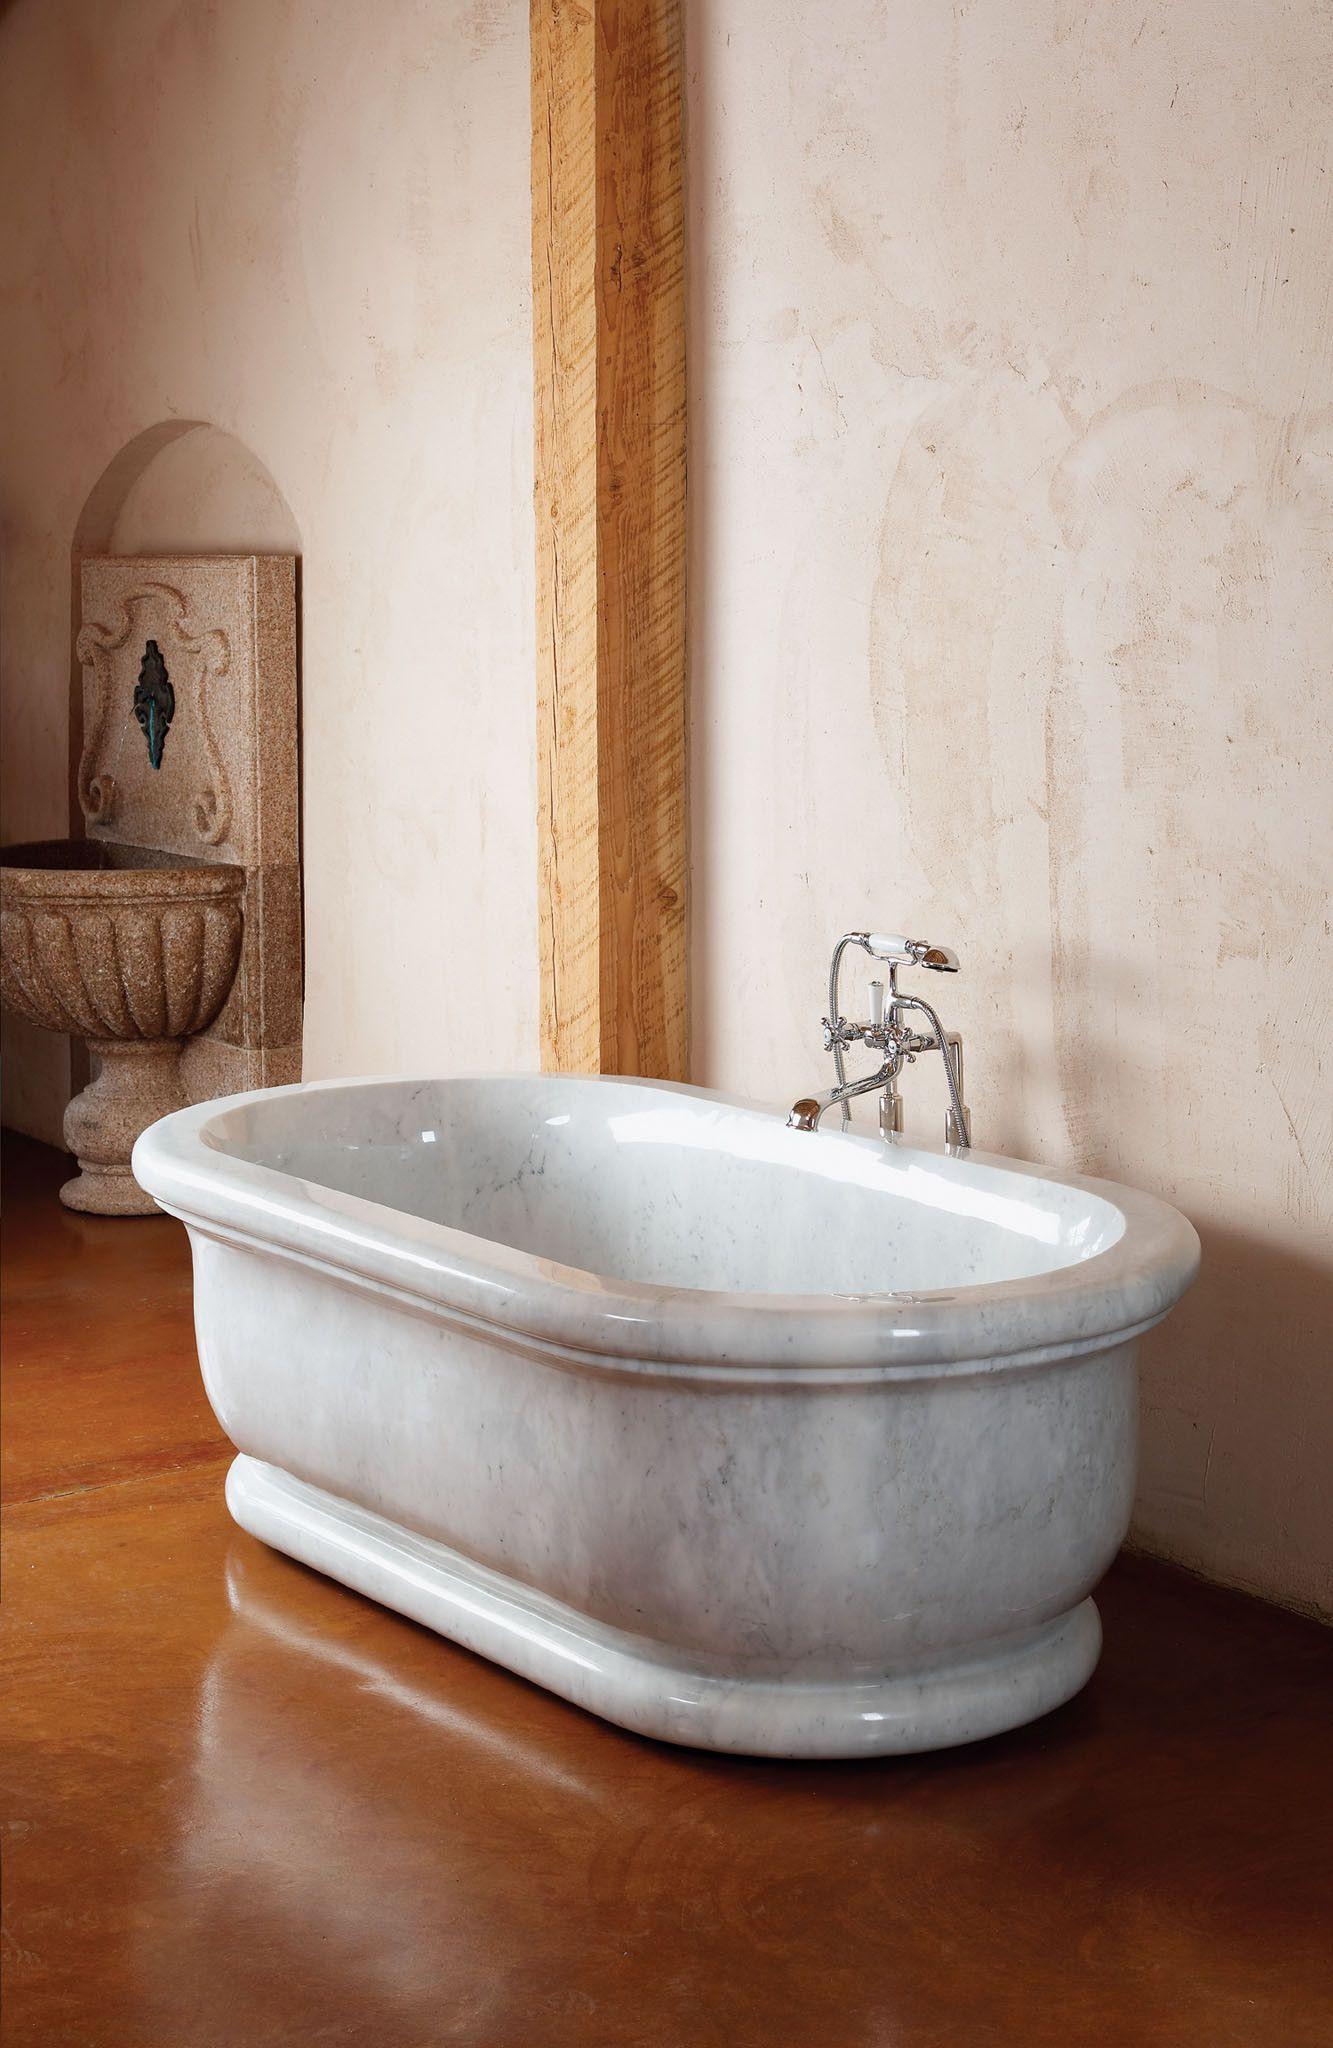 Roman Bathtub | Home | Pinterest | Bathtubs and Roman